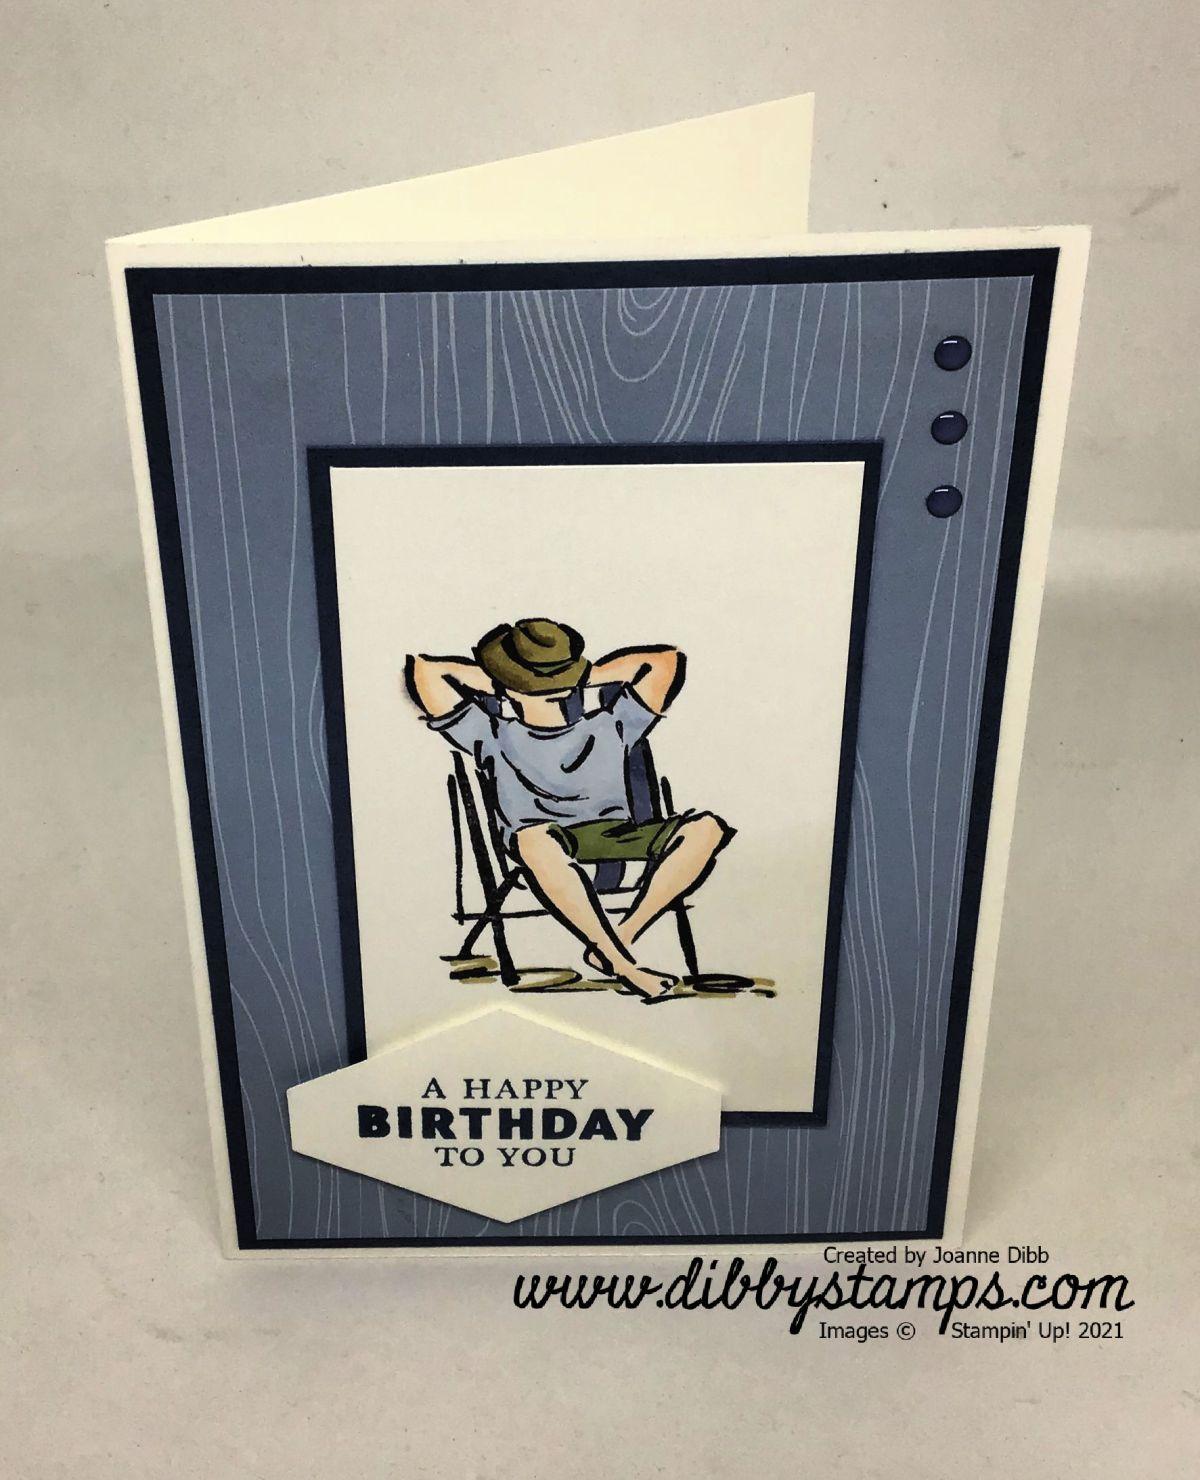 Birthday Card with A GoodMan